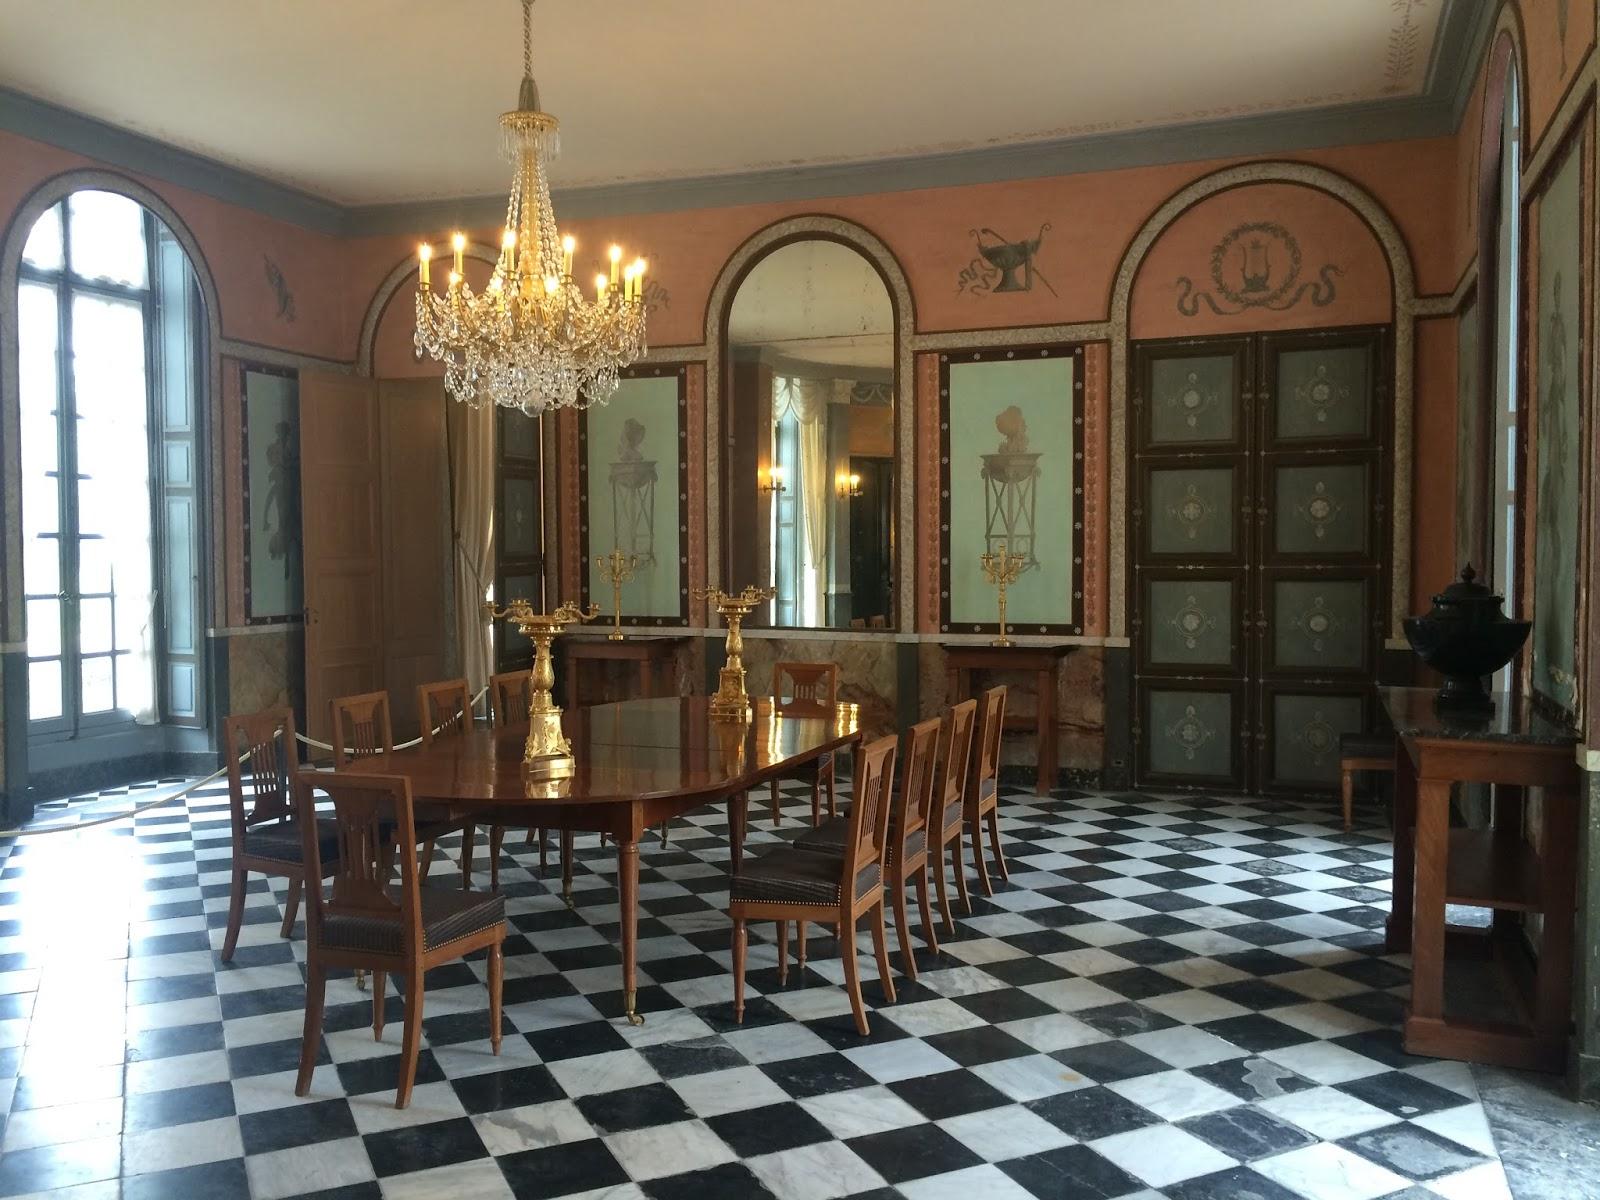 Say oui to paris june 2016 - Billard salle a manger ...